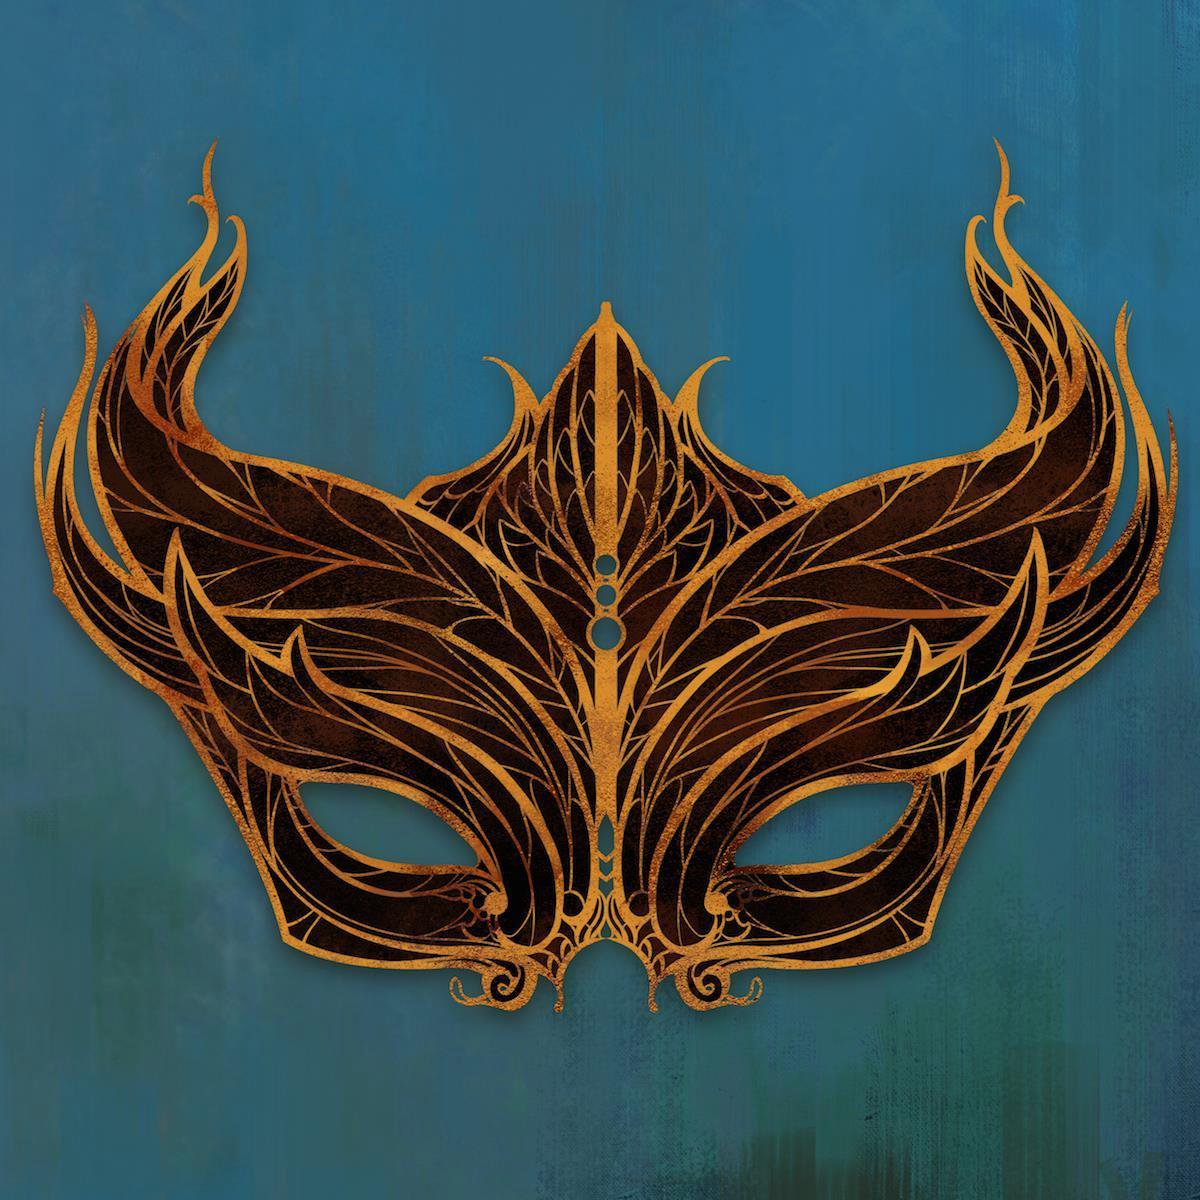 Masquerada on Twitter: